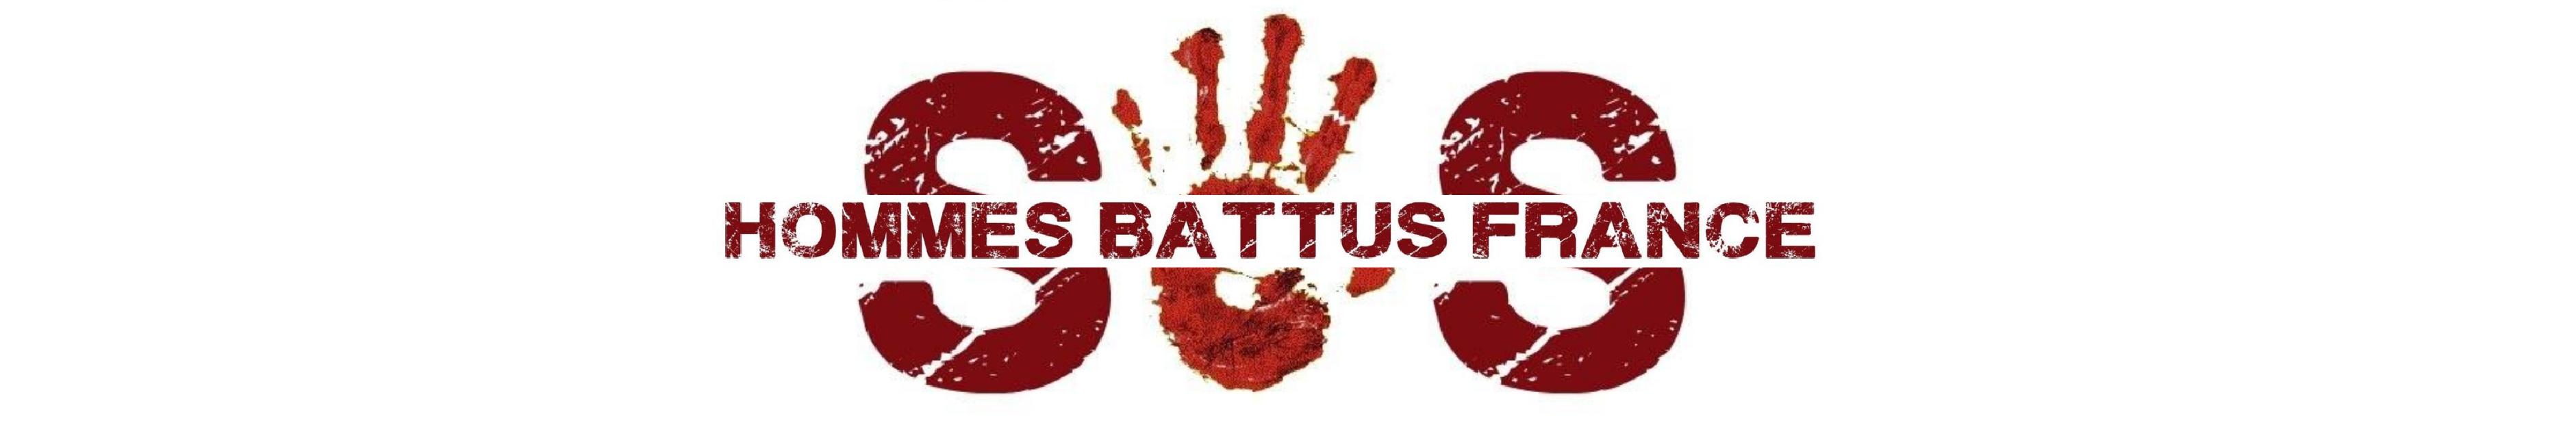 SOS Hommes Battus France Logo